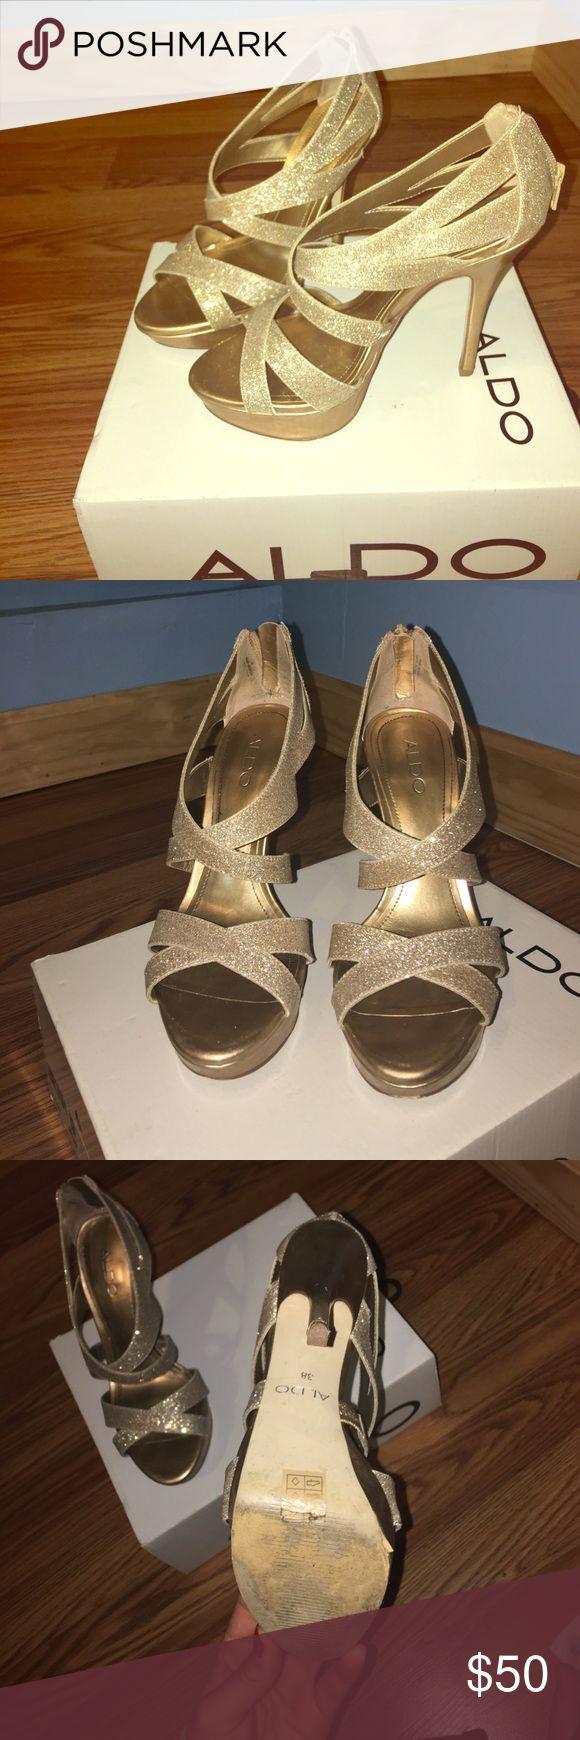 Aldo heels Glittery gold heels Aldo Shoes Platforms